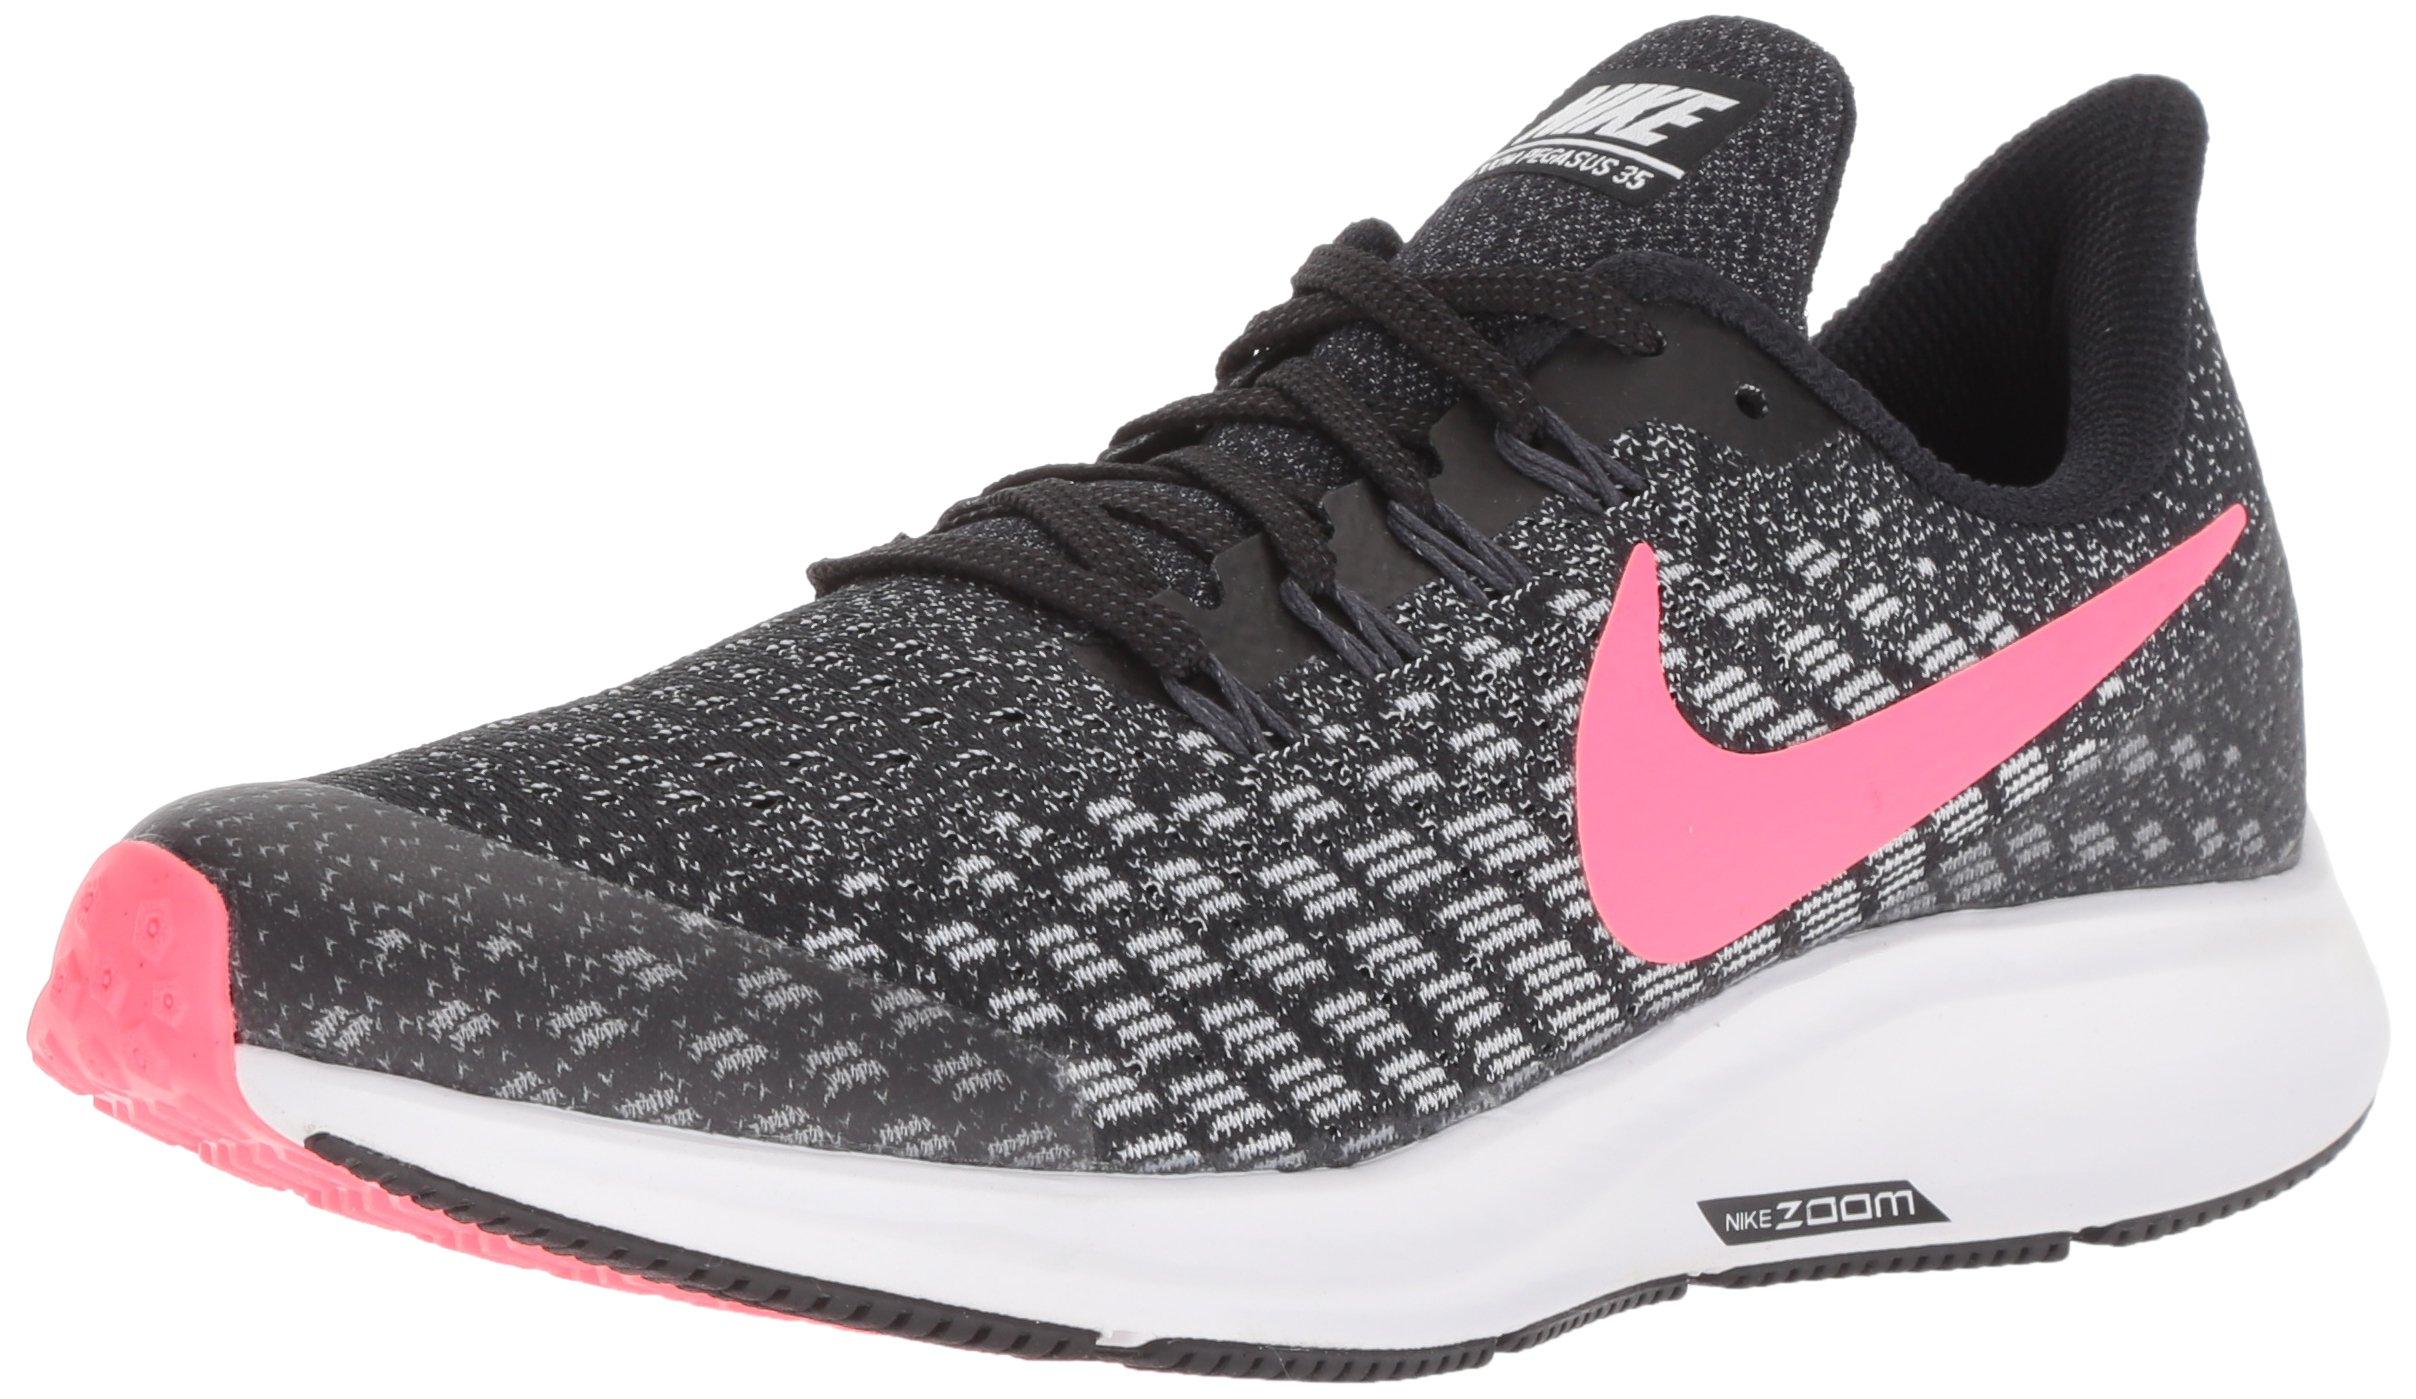 Girl's Air Zoom Pegasus 35 Running Shoe Black/Racer Pink/White/Anthracite Size 6.5 M US